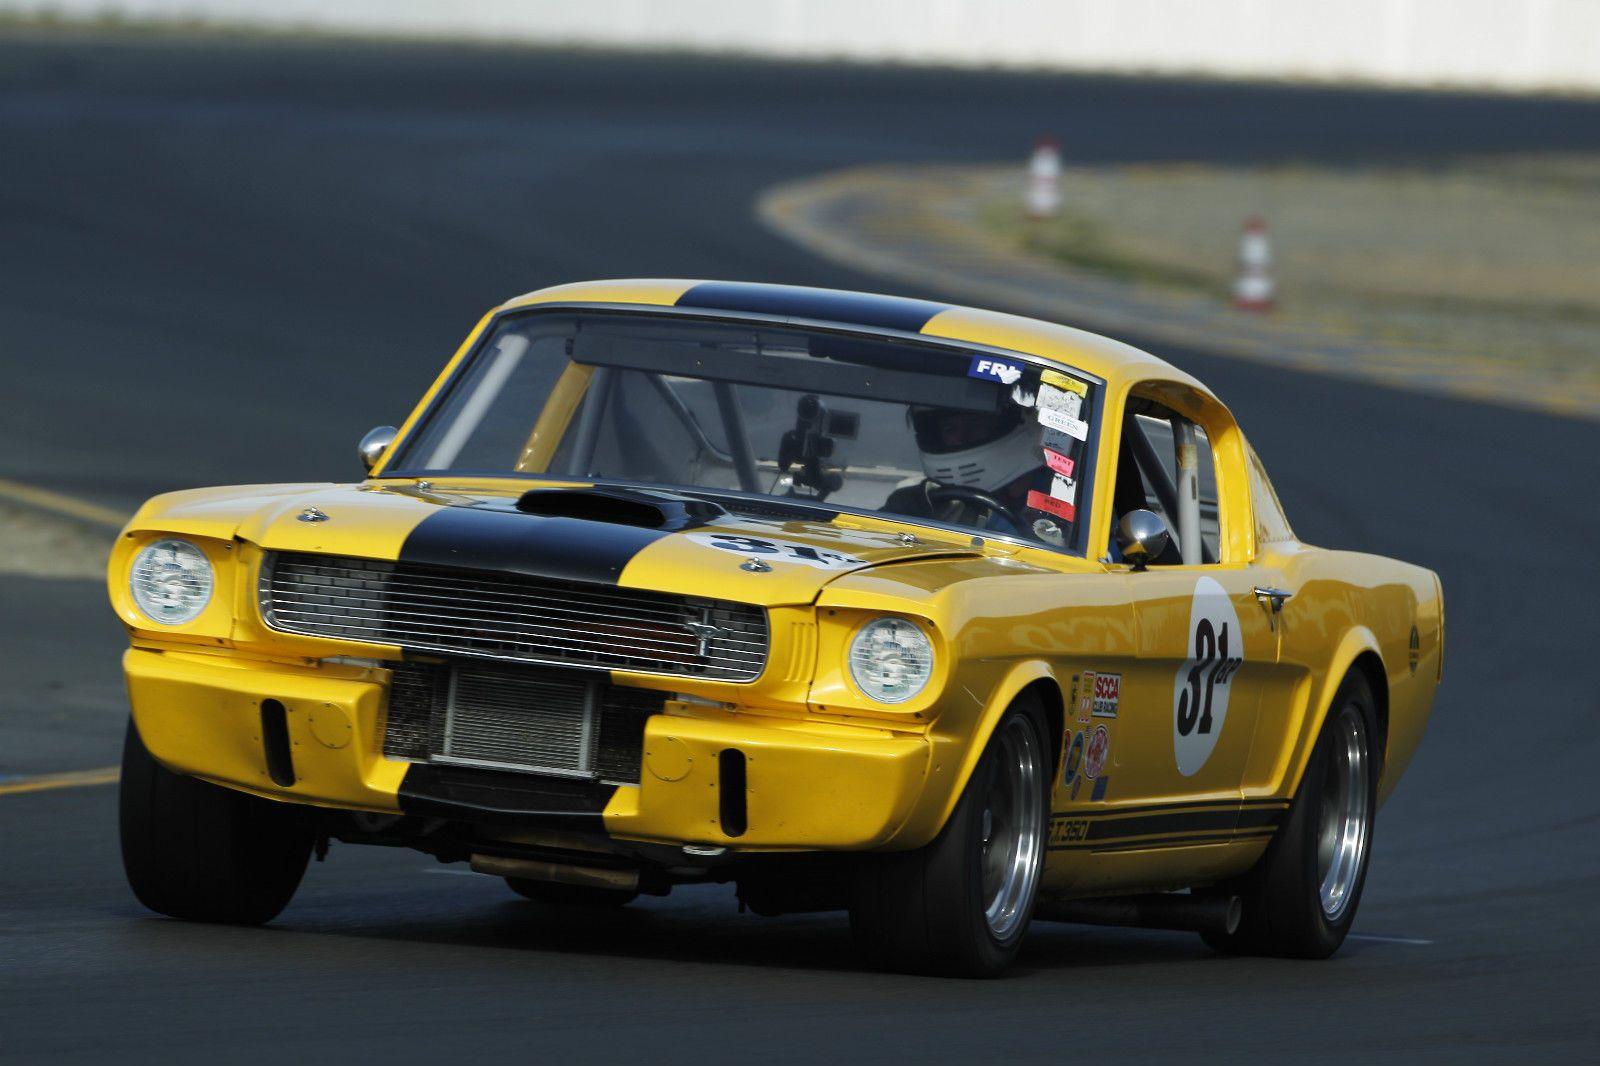 A rare original 1966 shelby gt350 vintage race car